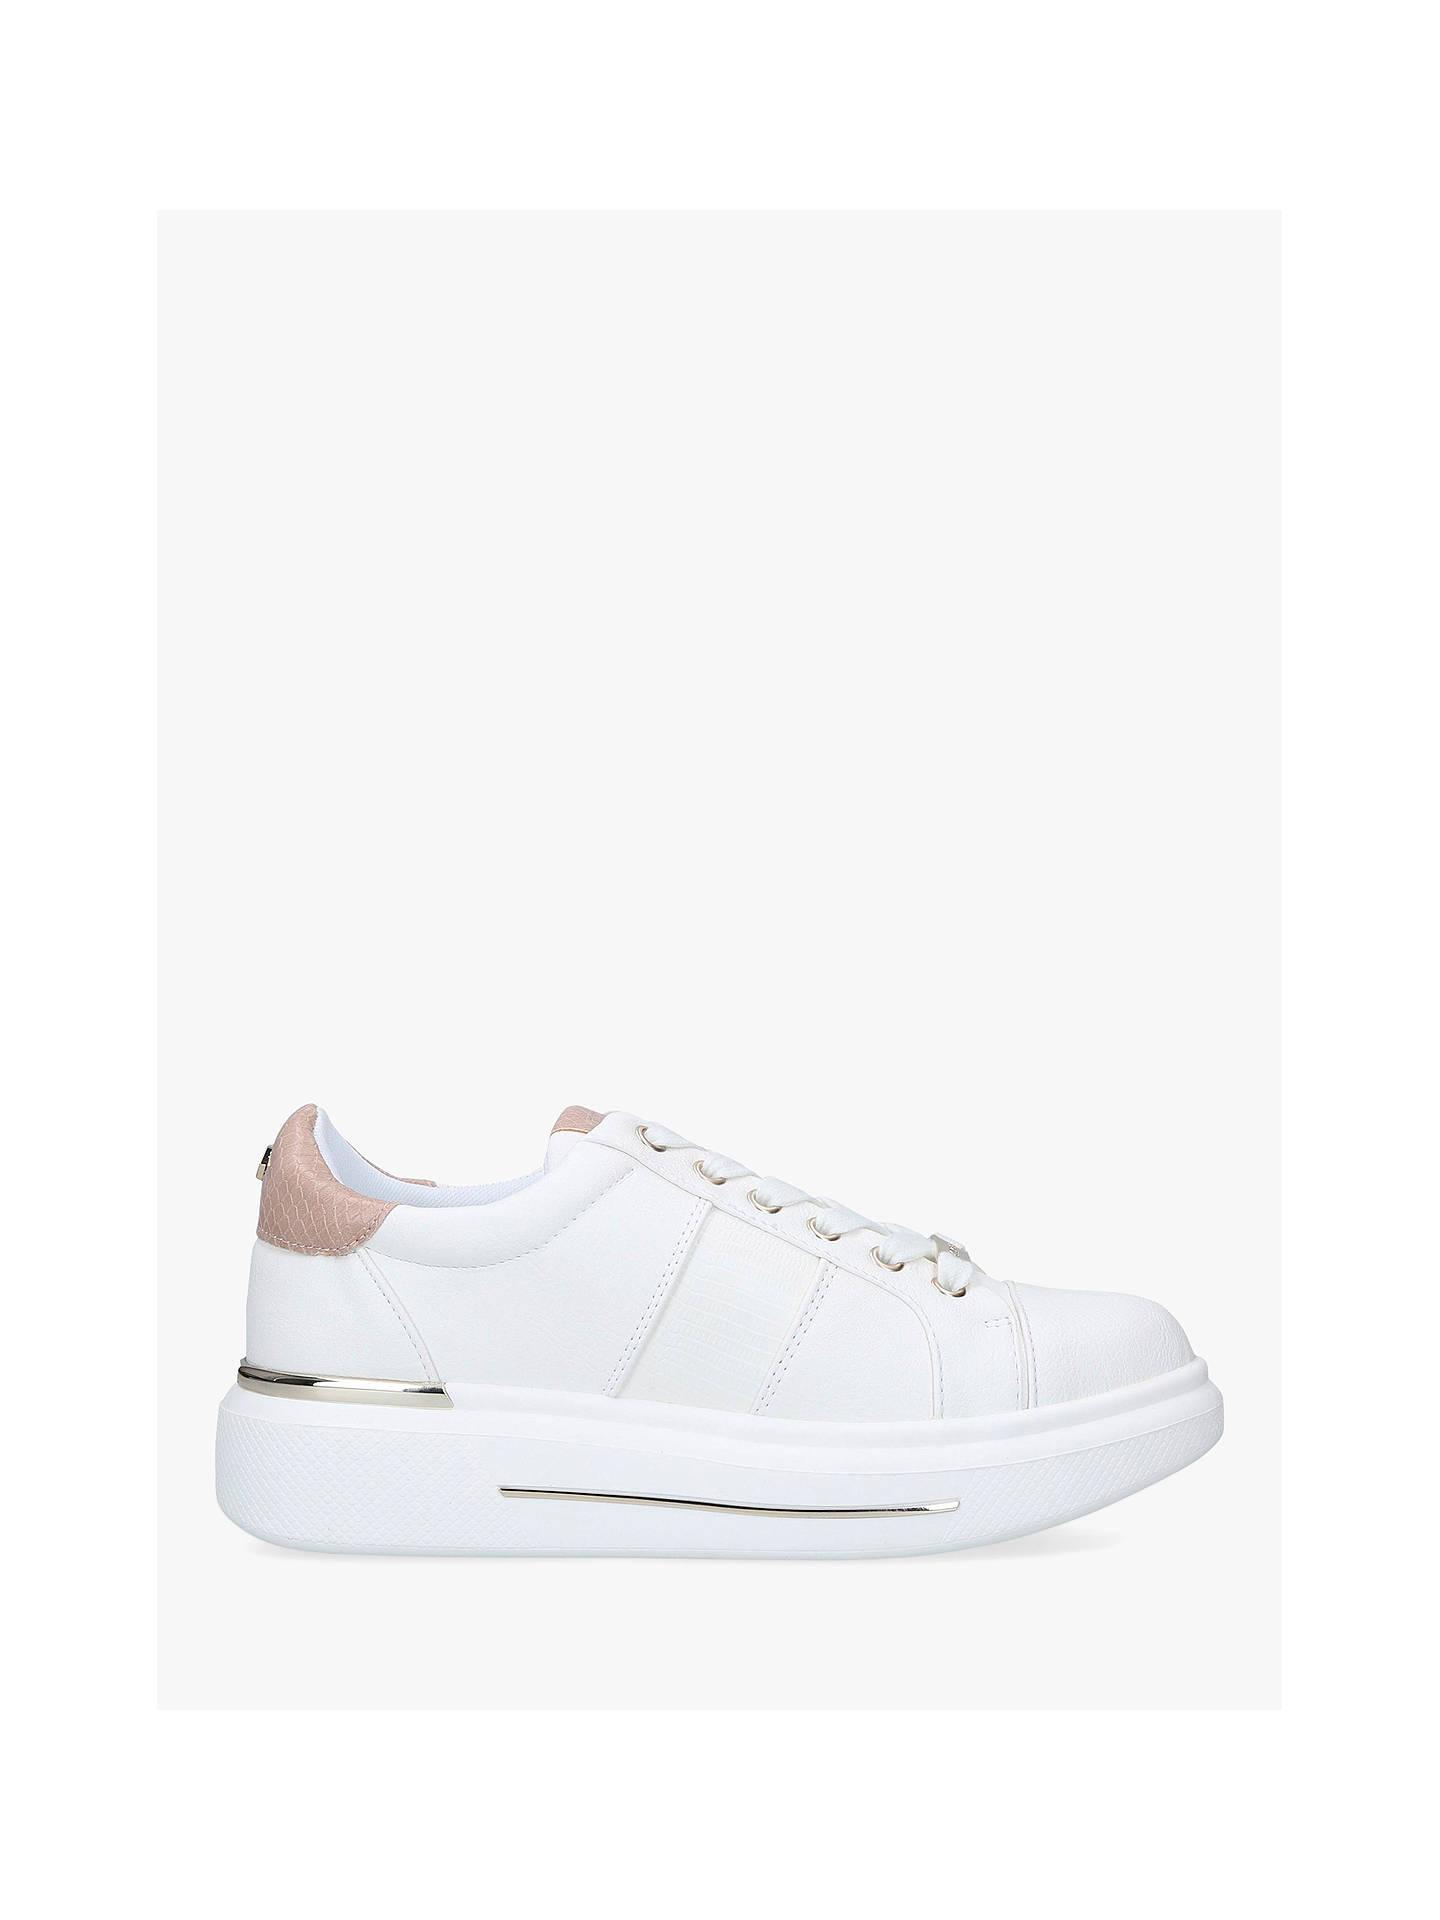 Carvela Jubilate Heel Embellished Chunky Trainers, White/Pink by Carvela